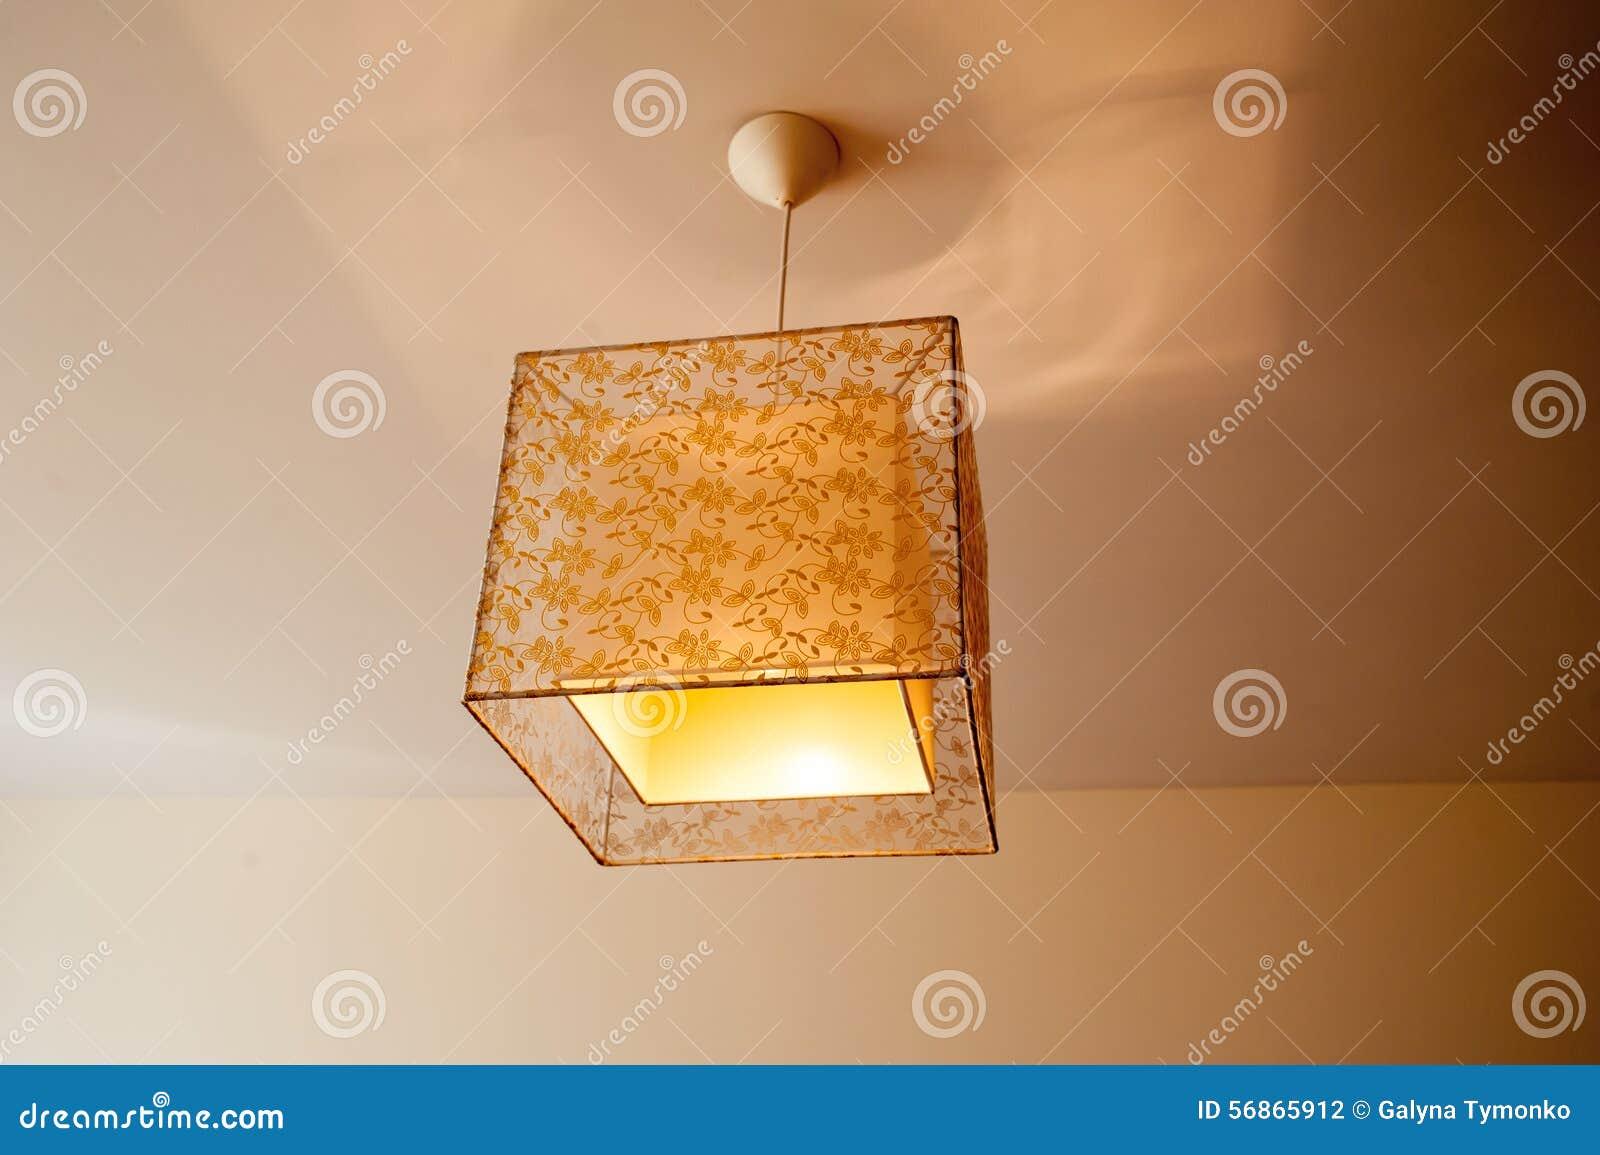 Slaapkamer Lamp Plafond : Mooie lamp op het plafond in de slaapkamer stock foto afbeelding